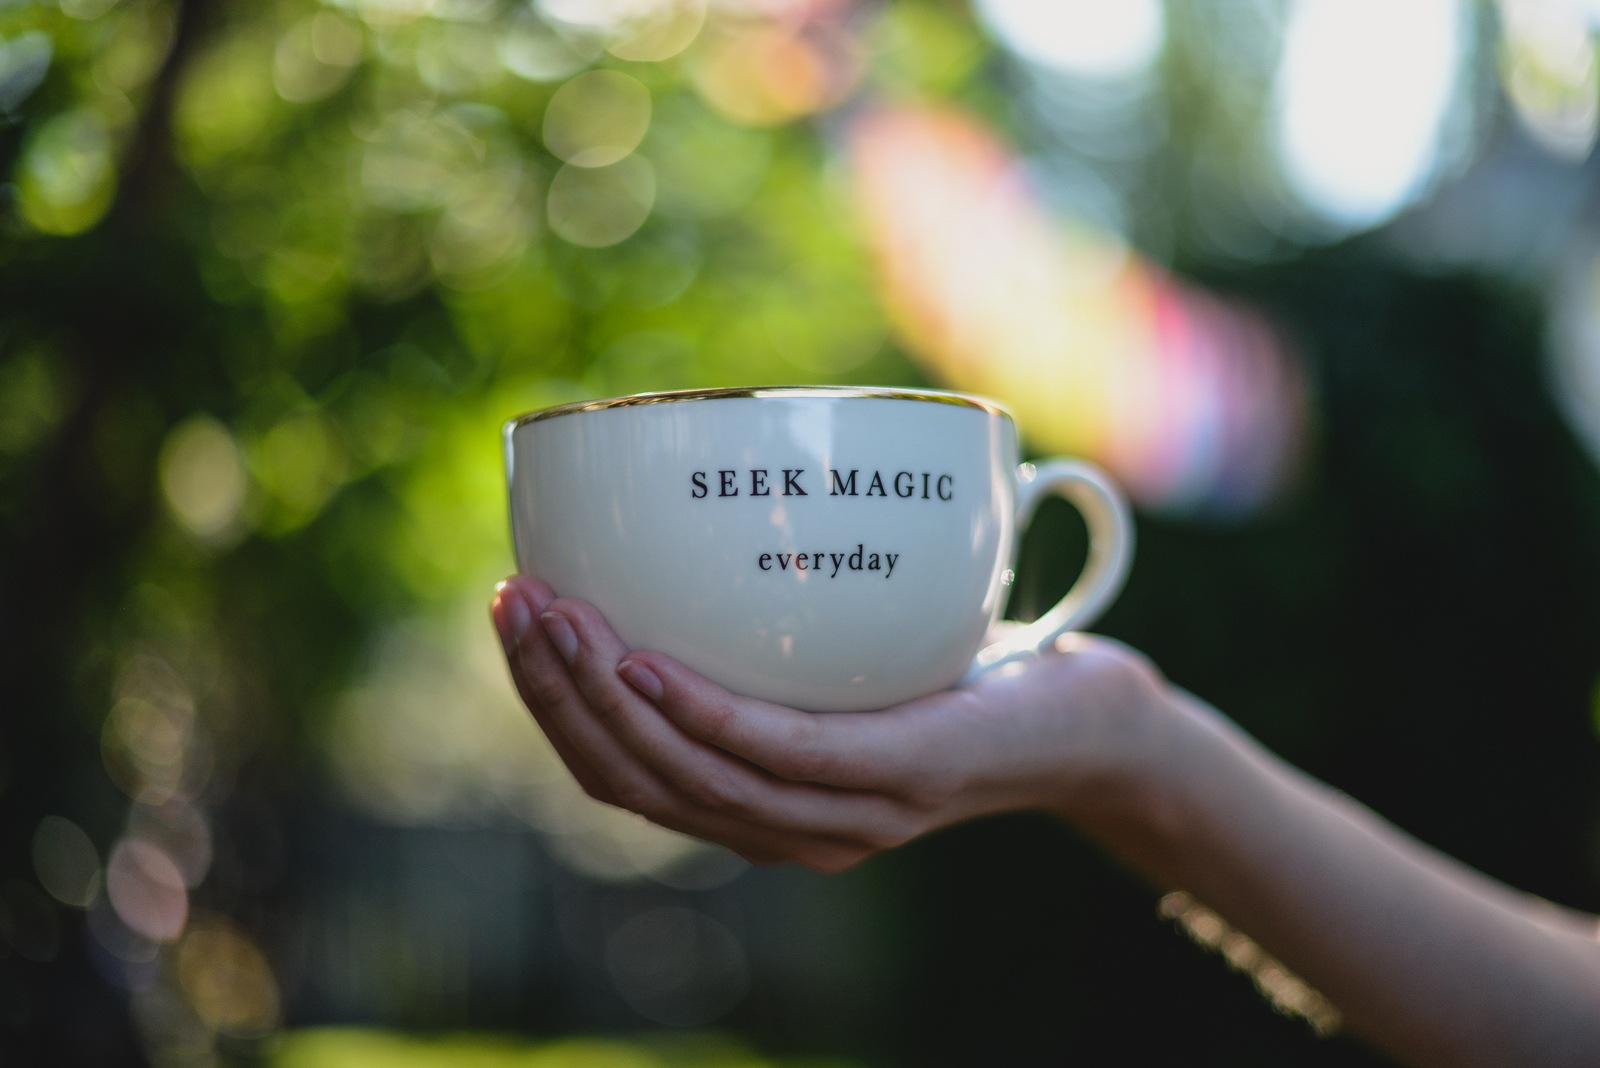 seek magic